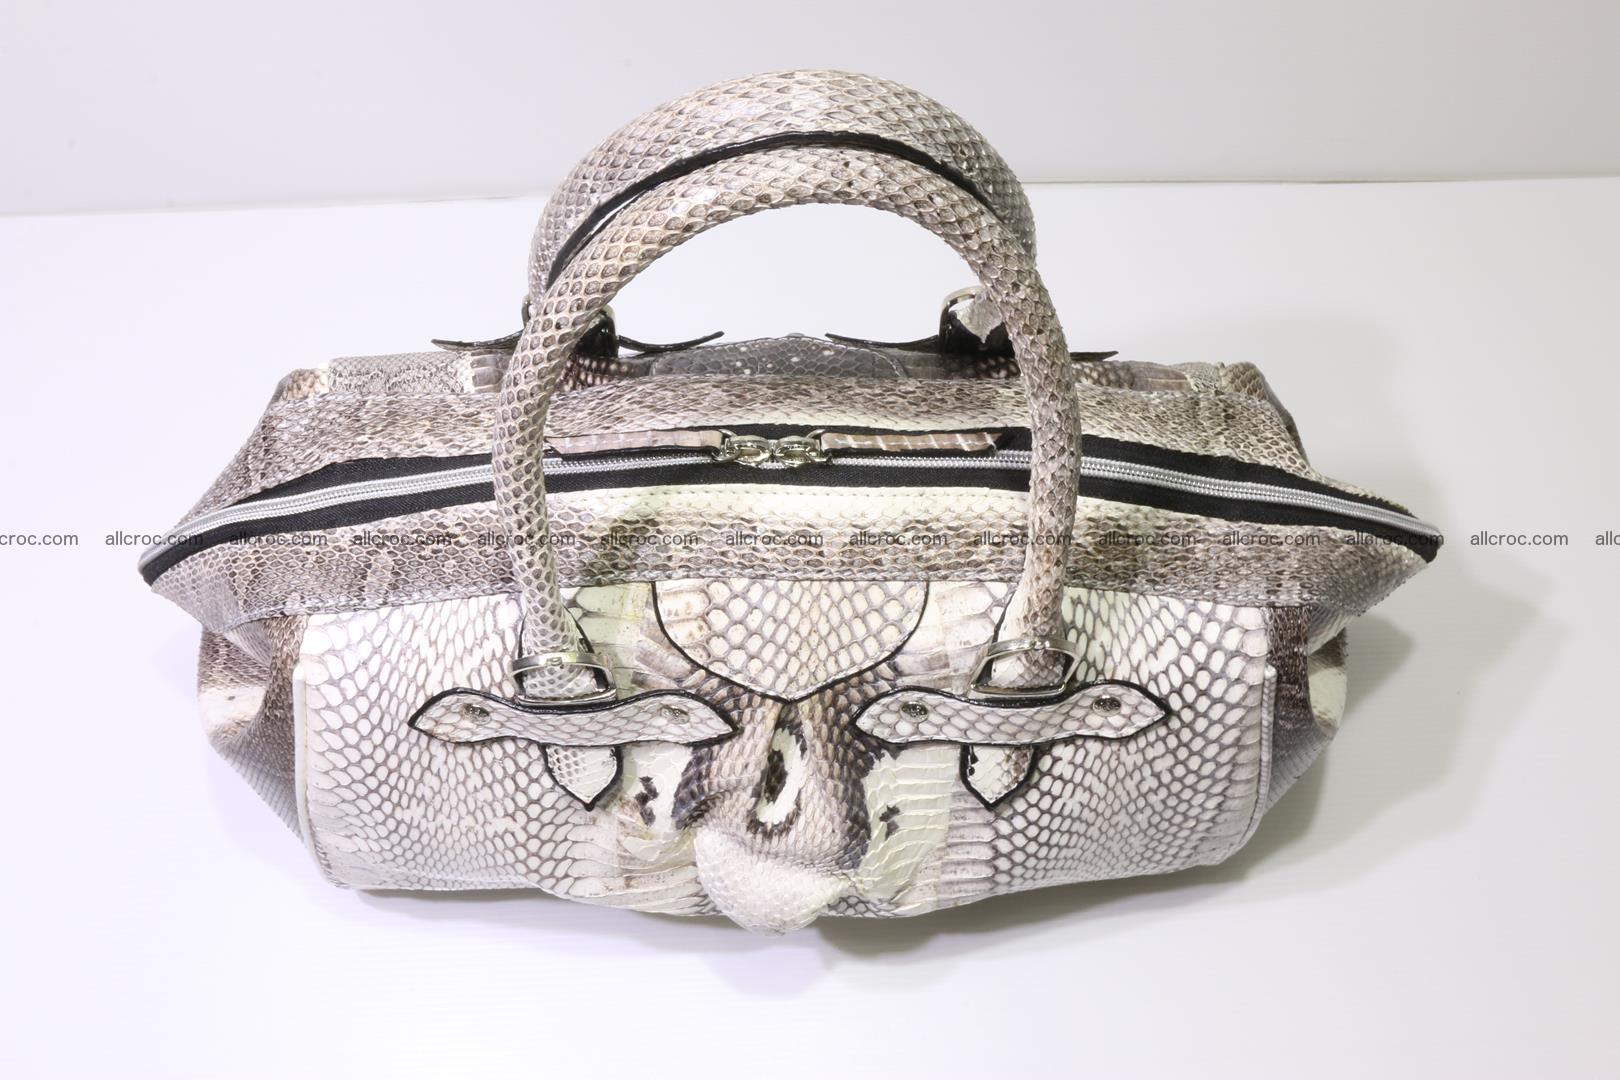 Cobra skin ladies handbag with head of cobra 192 Foto 5